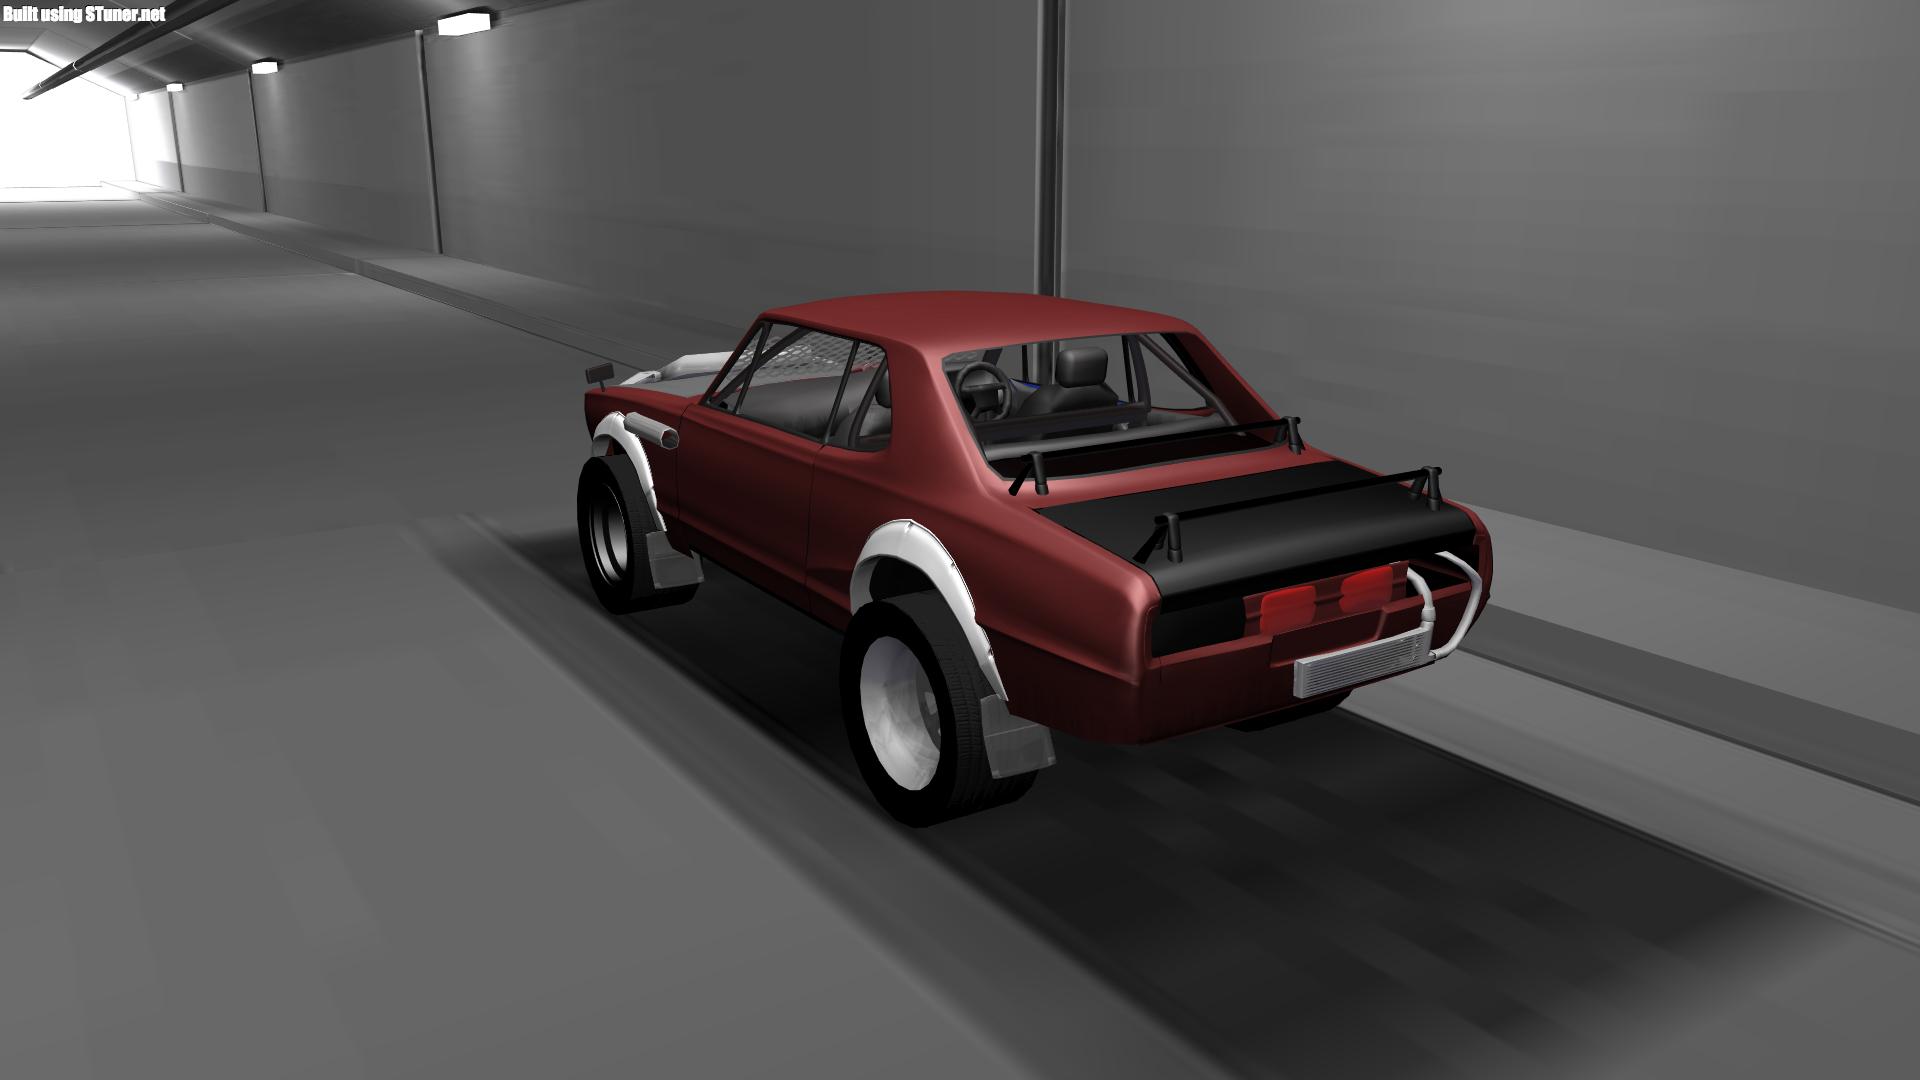 [Image: apocalypse-car-3-5488f9655f711.jpg]